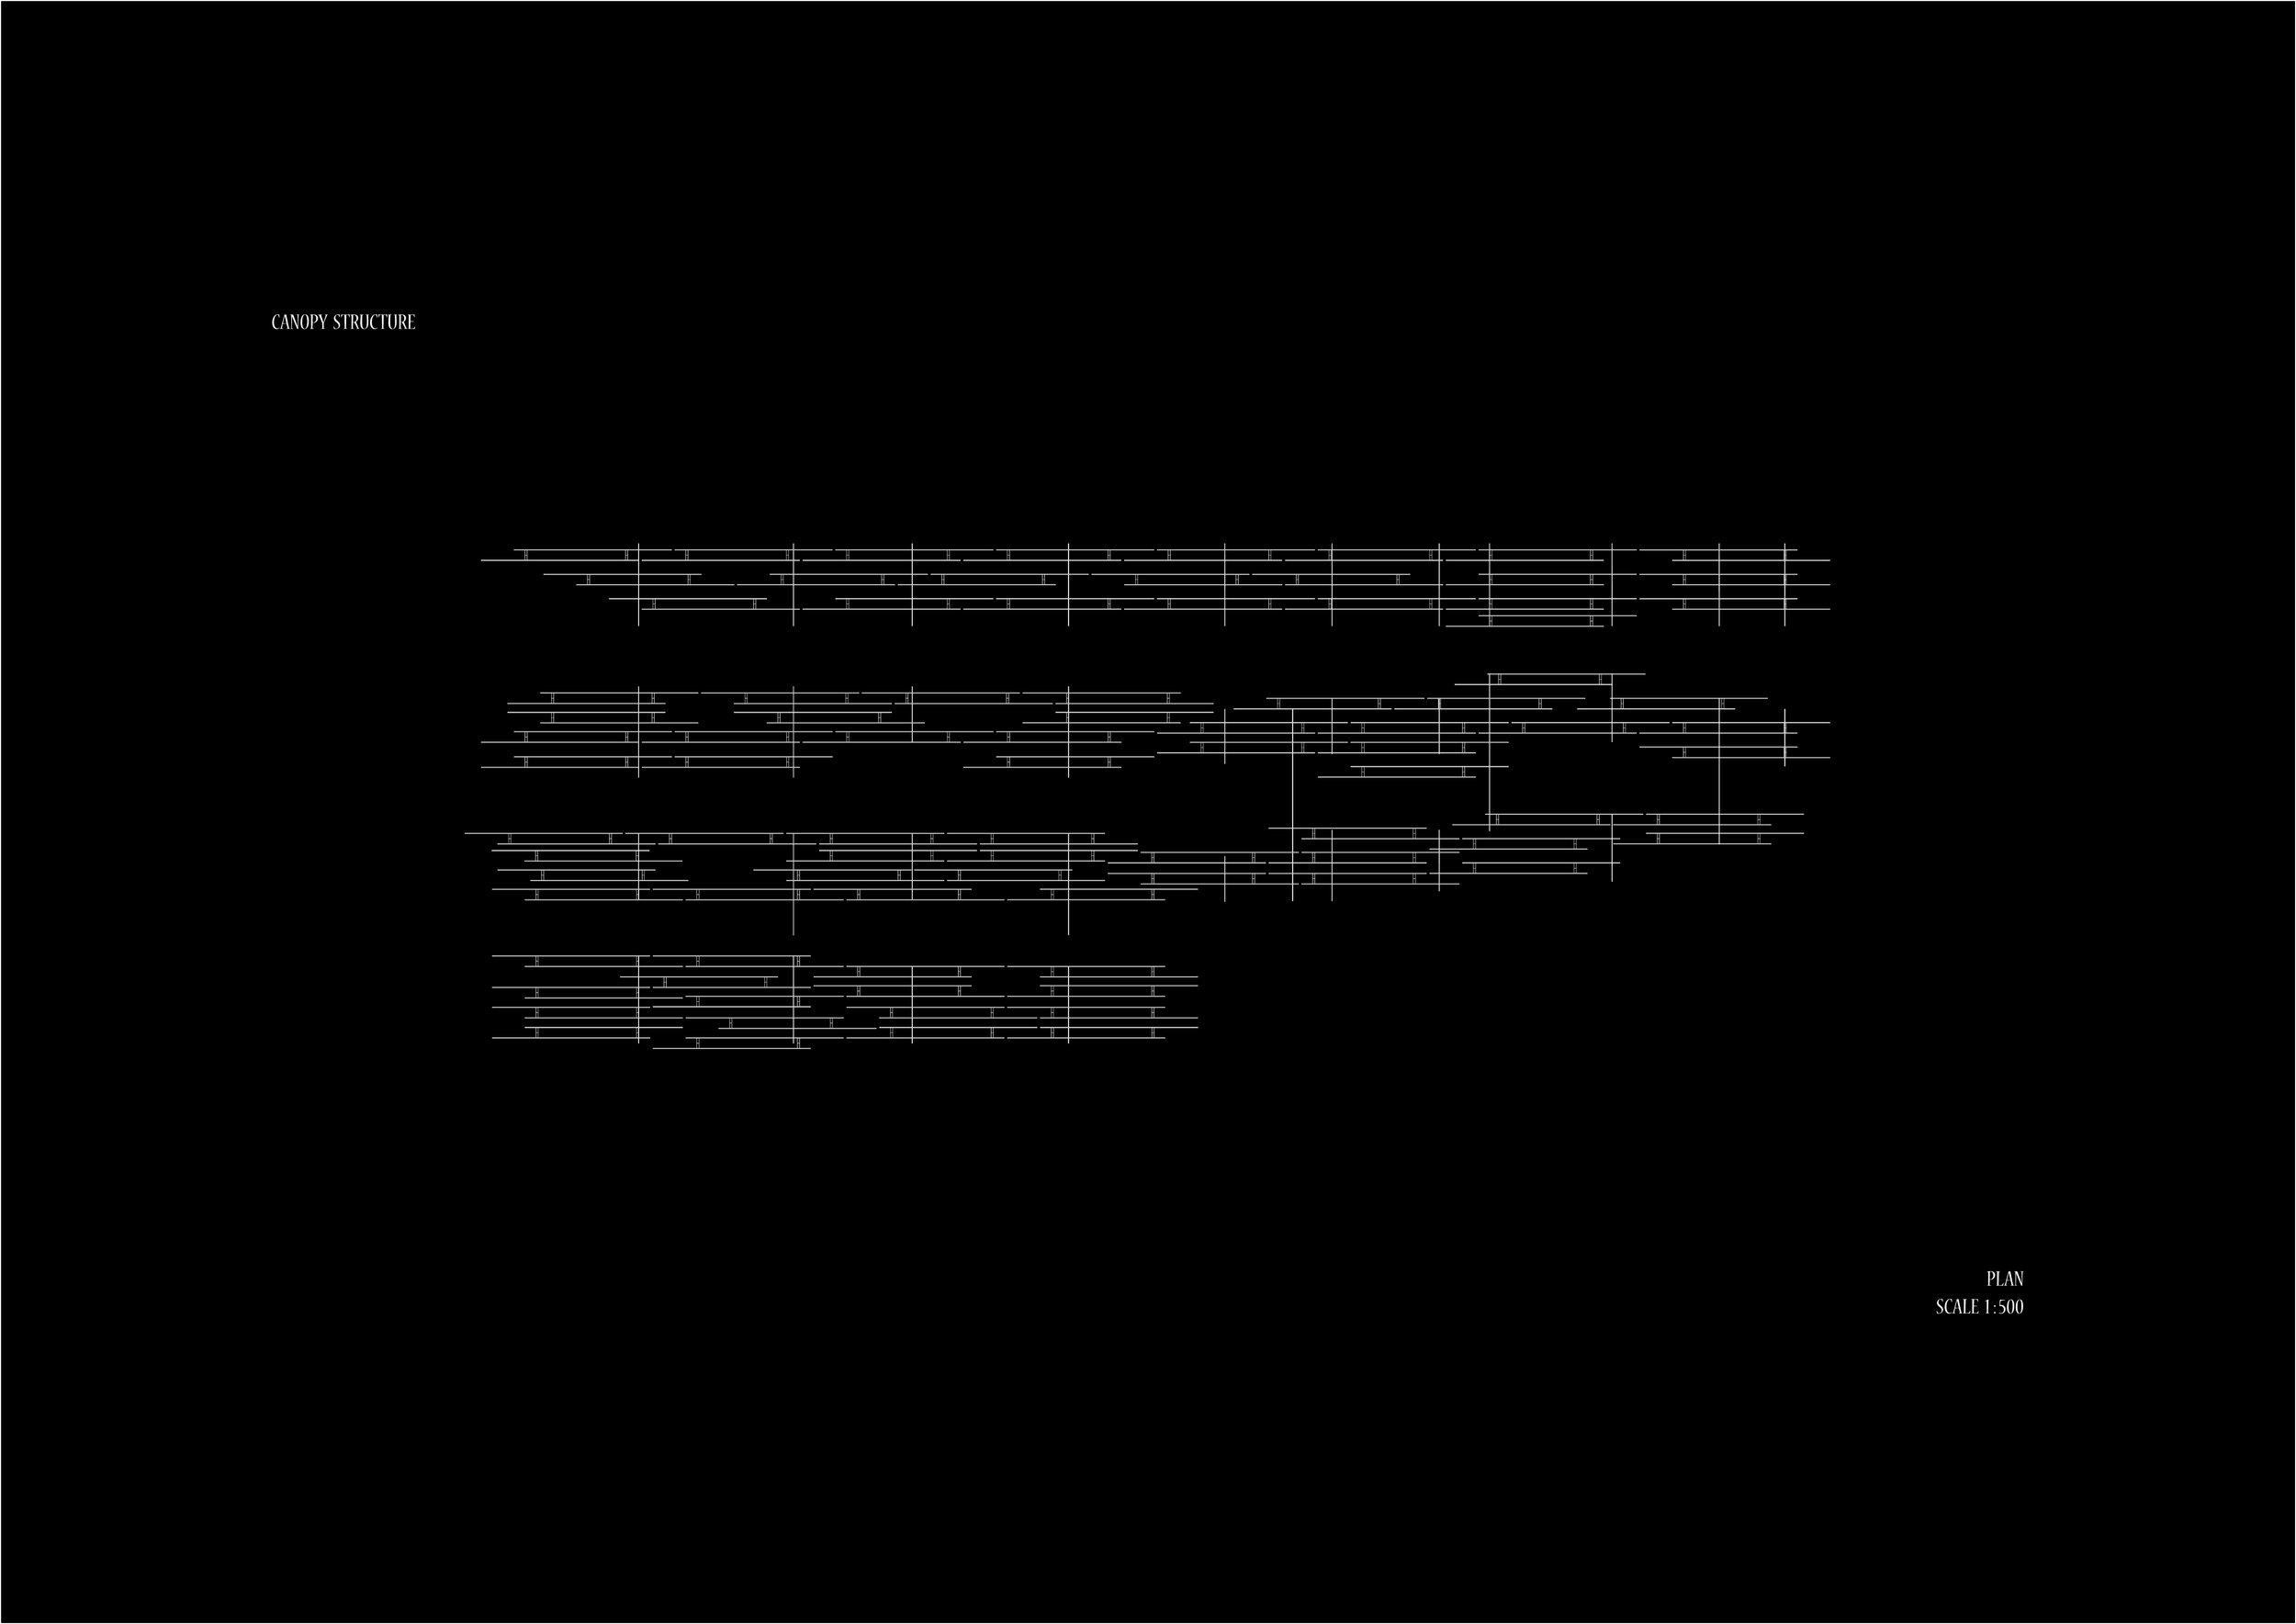 Diagram16_CanopyStructure.jpg